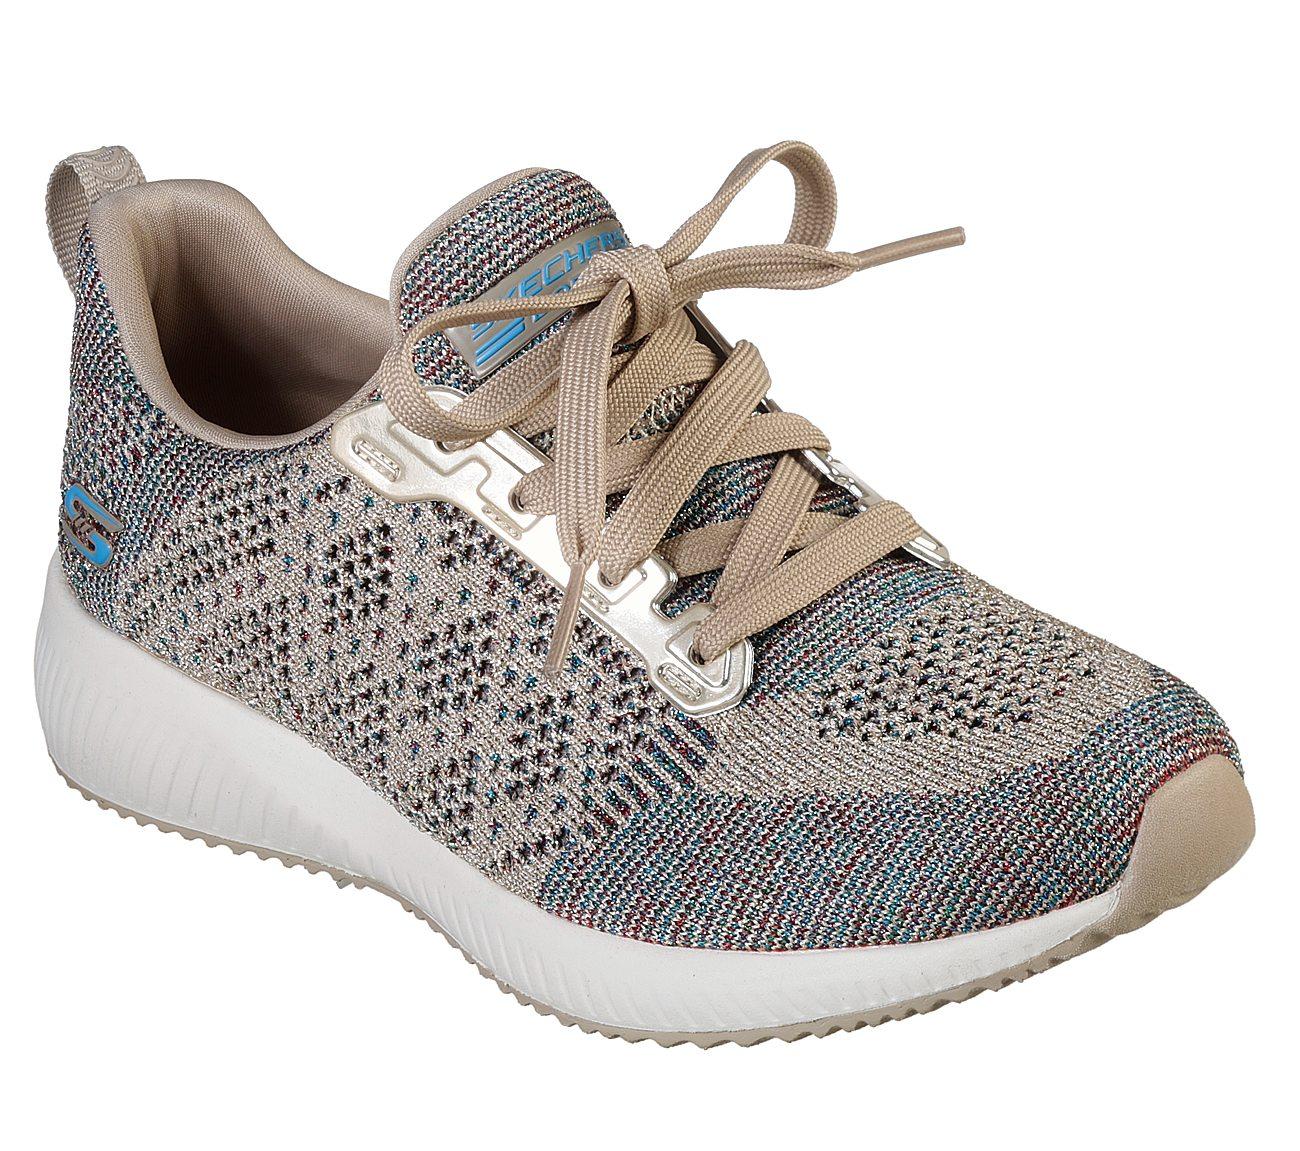 671ee7560eb6 Buy SKECHERS BOBS Sport Squad - Pop Color BOBS Shoes only  49.00